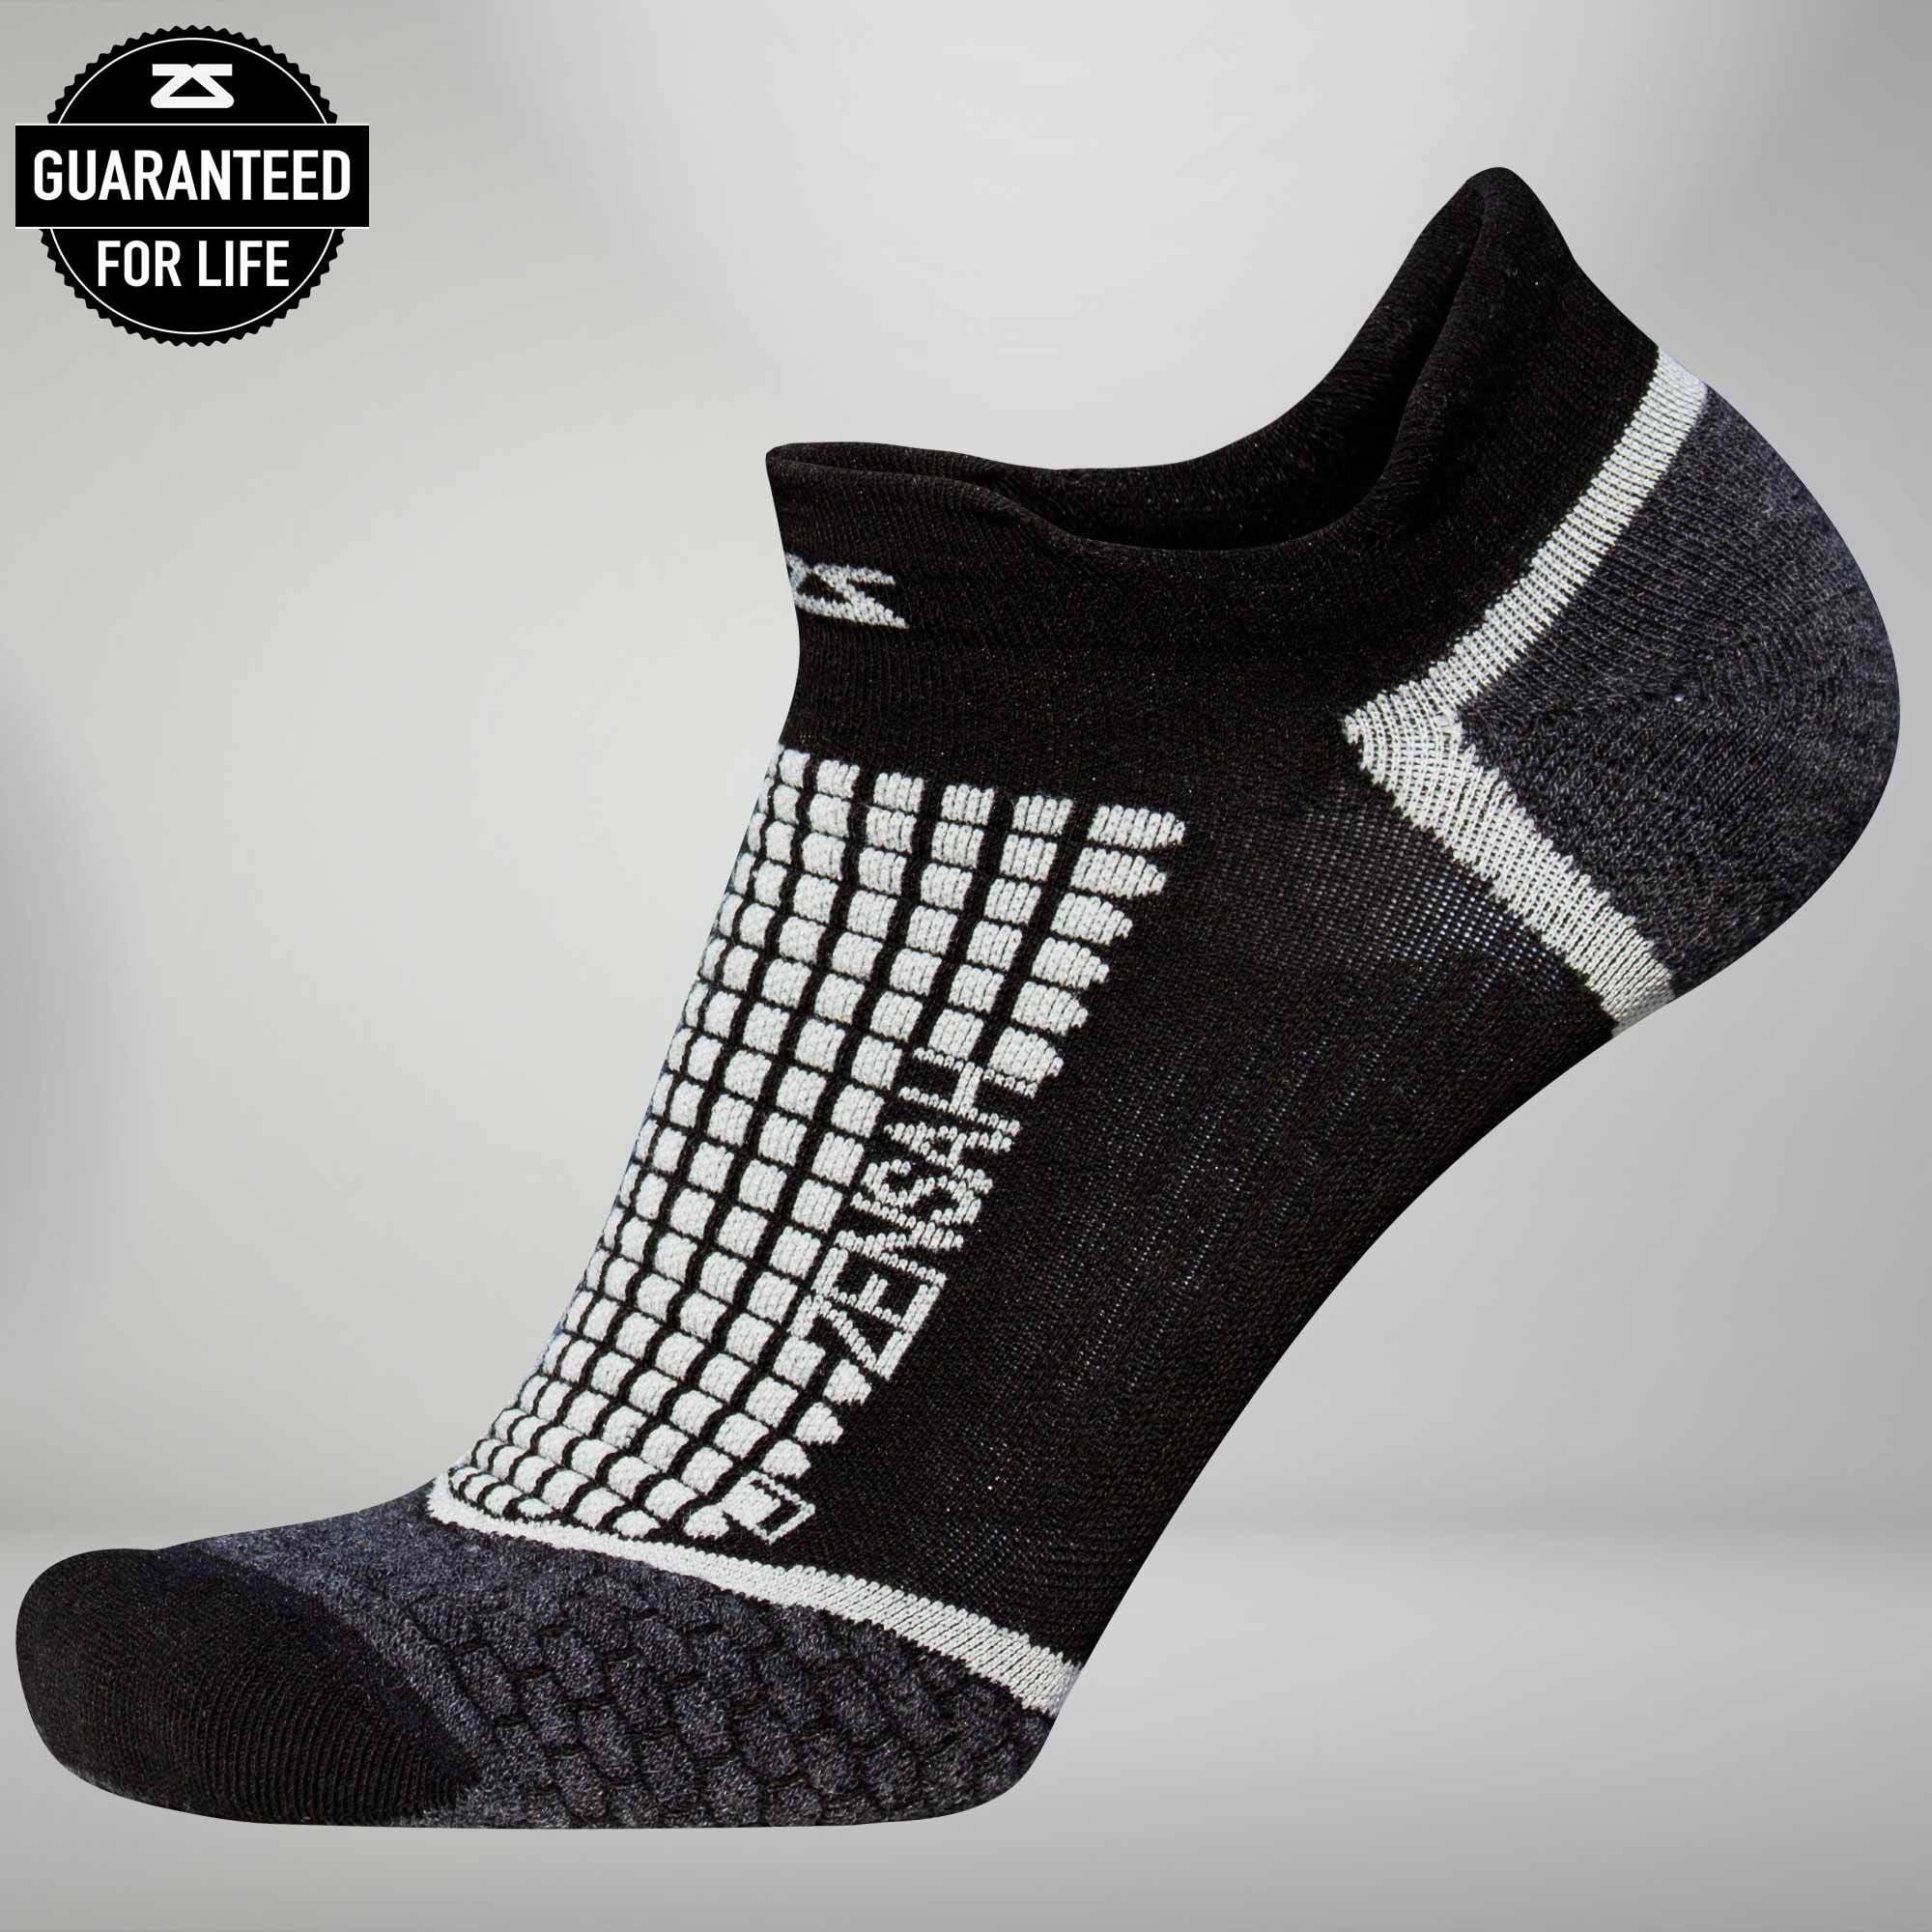 Grit Running Socks ™ (No-Show) L / Black